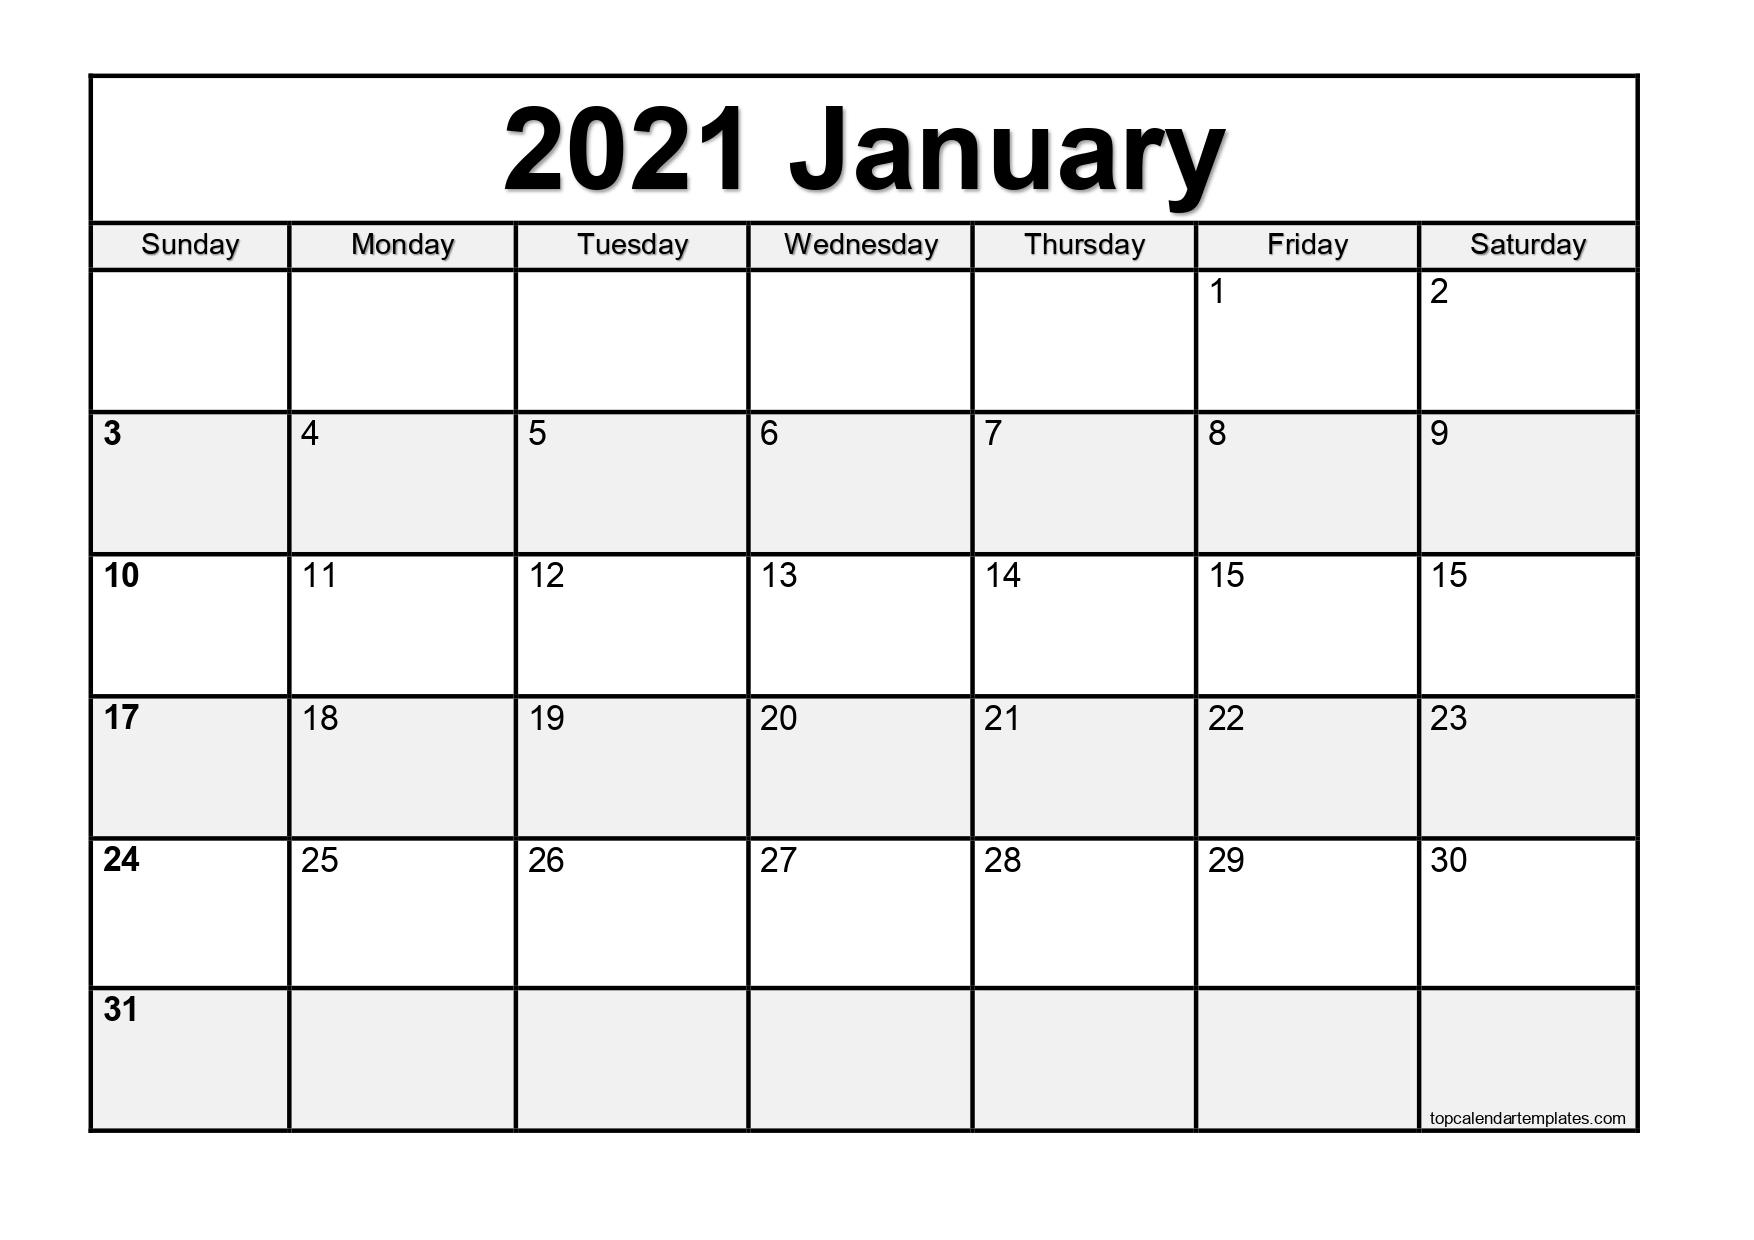 Free January 2021 Calendar Printable Blank Templates within Blank Monthly Calendar 2021